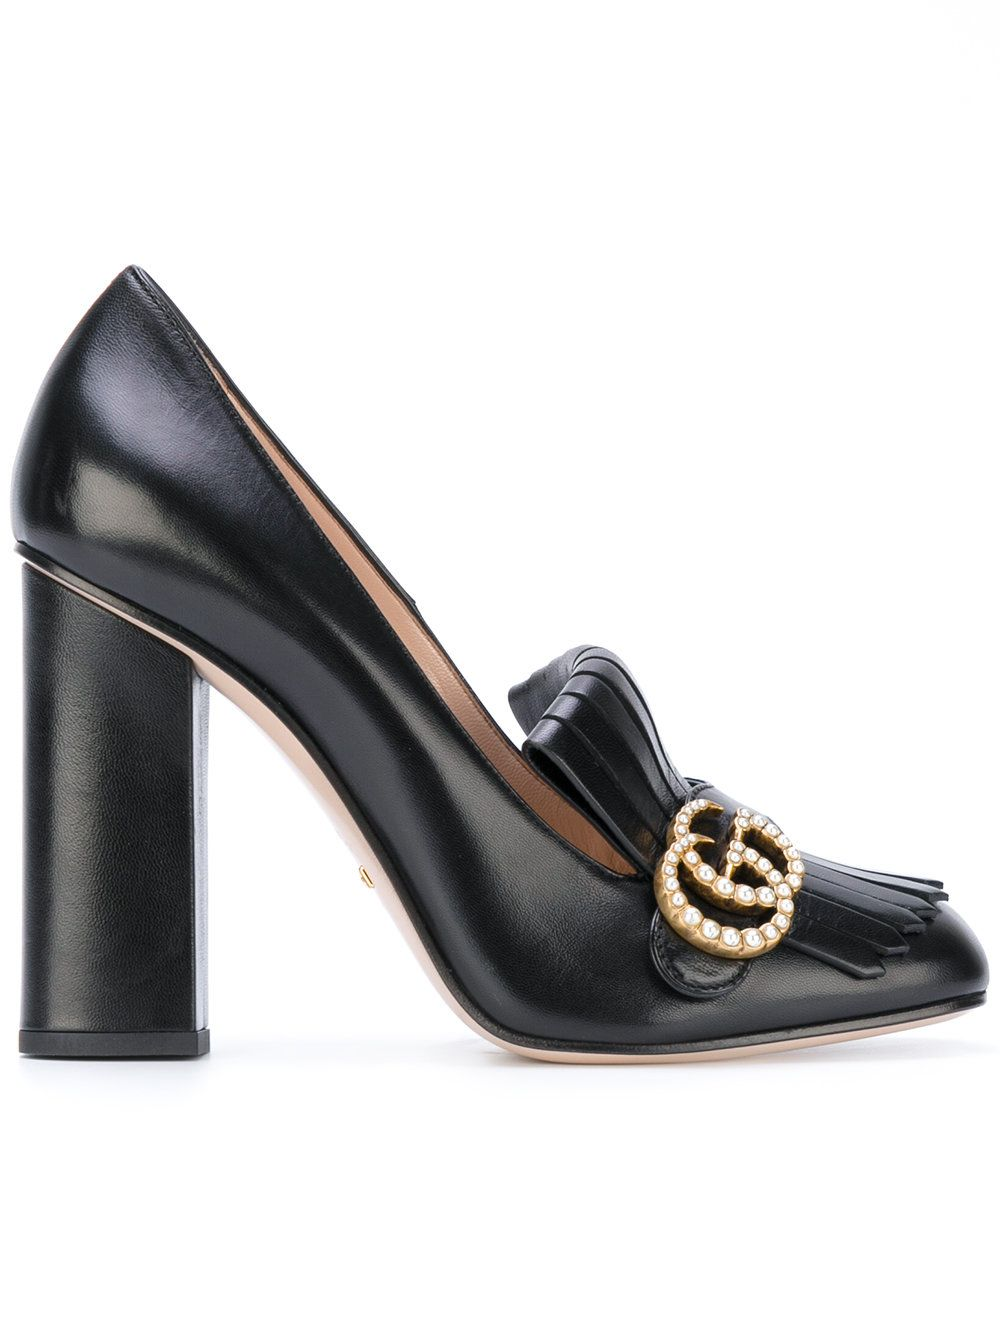 3c03148abcc Women s Metallic Marmont Fringed Loafer Heel